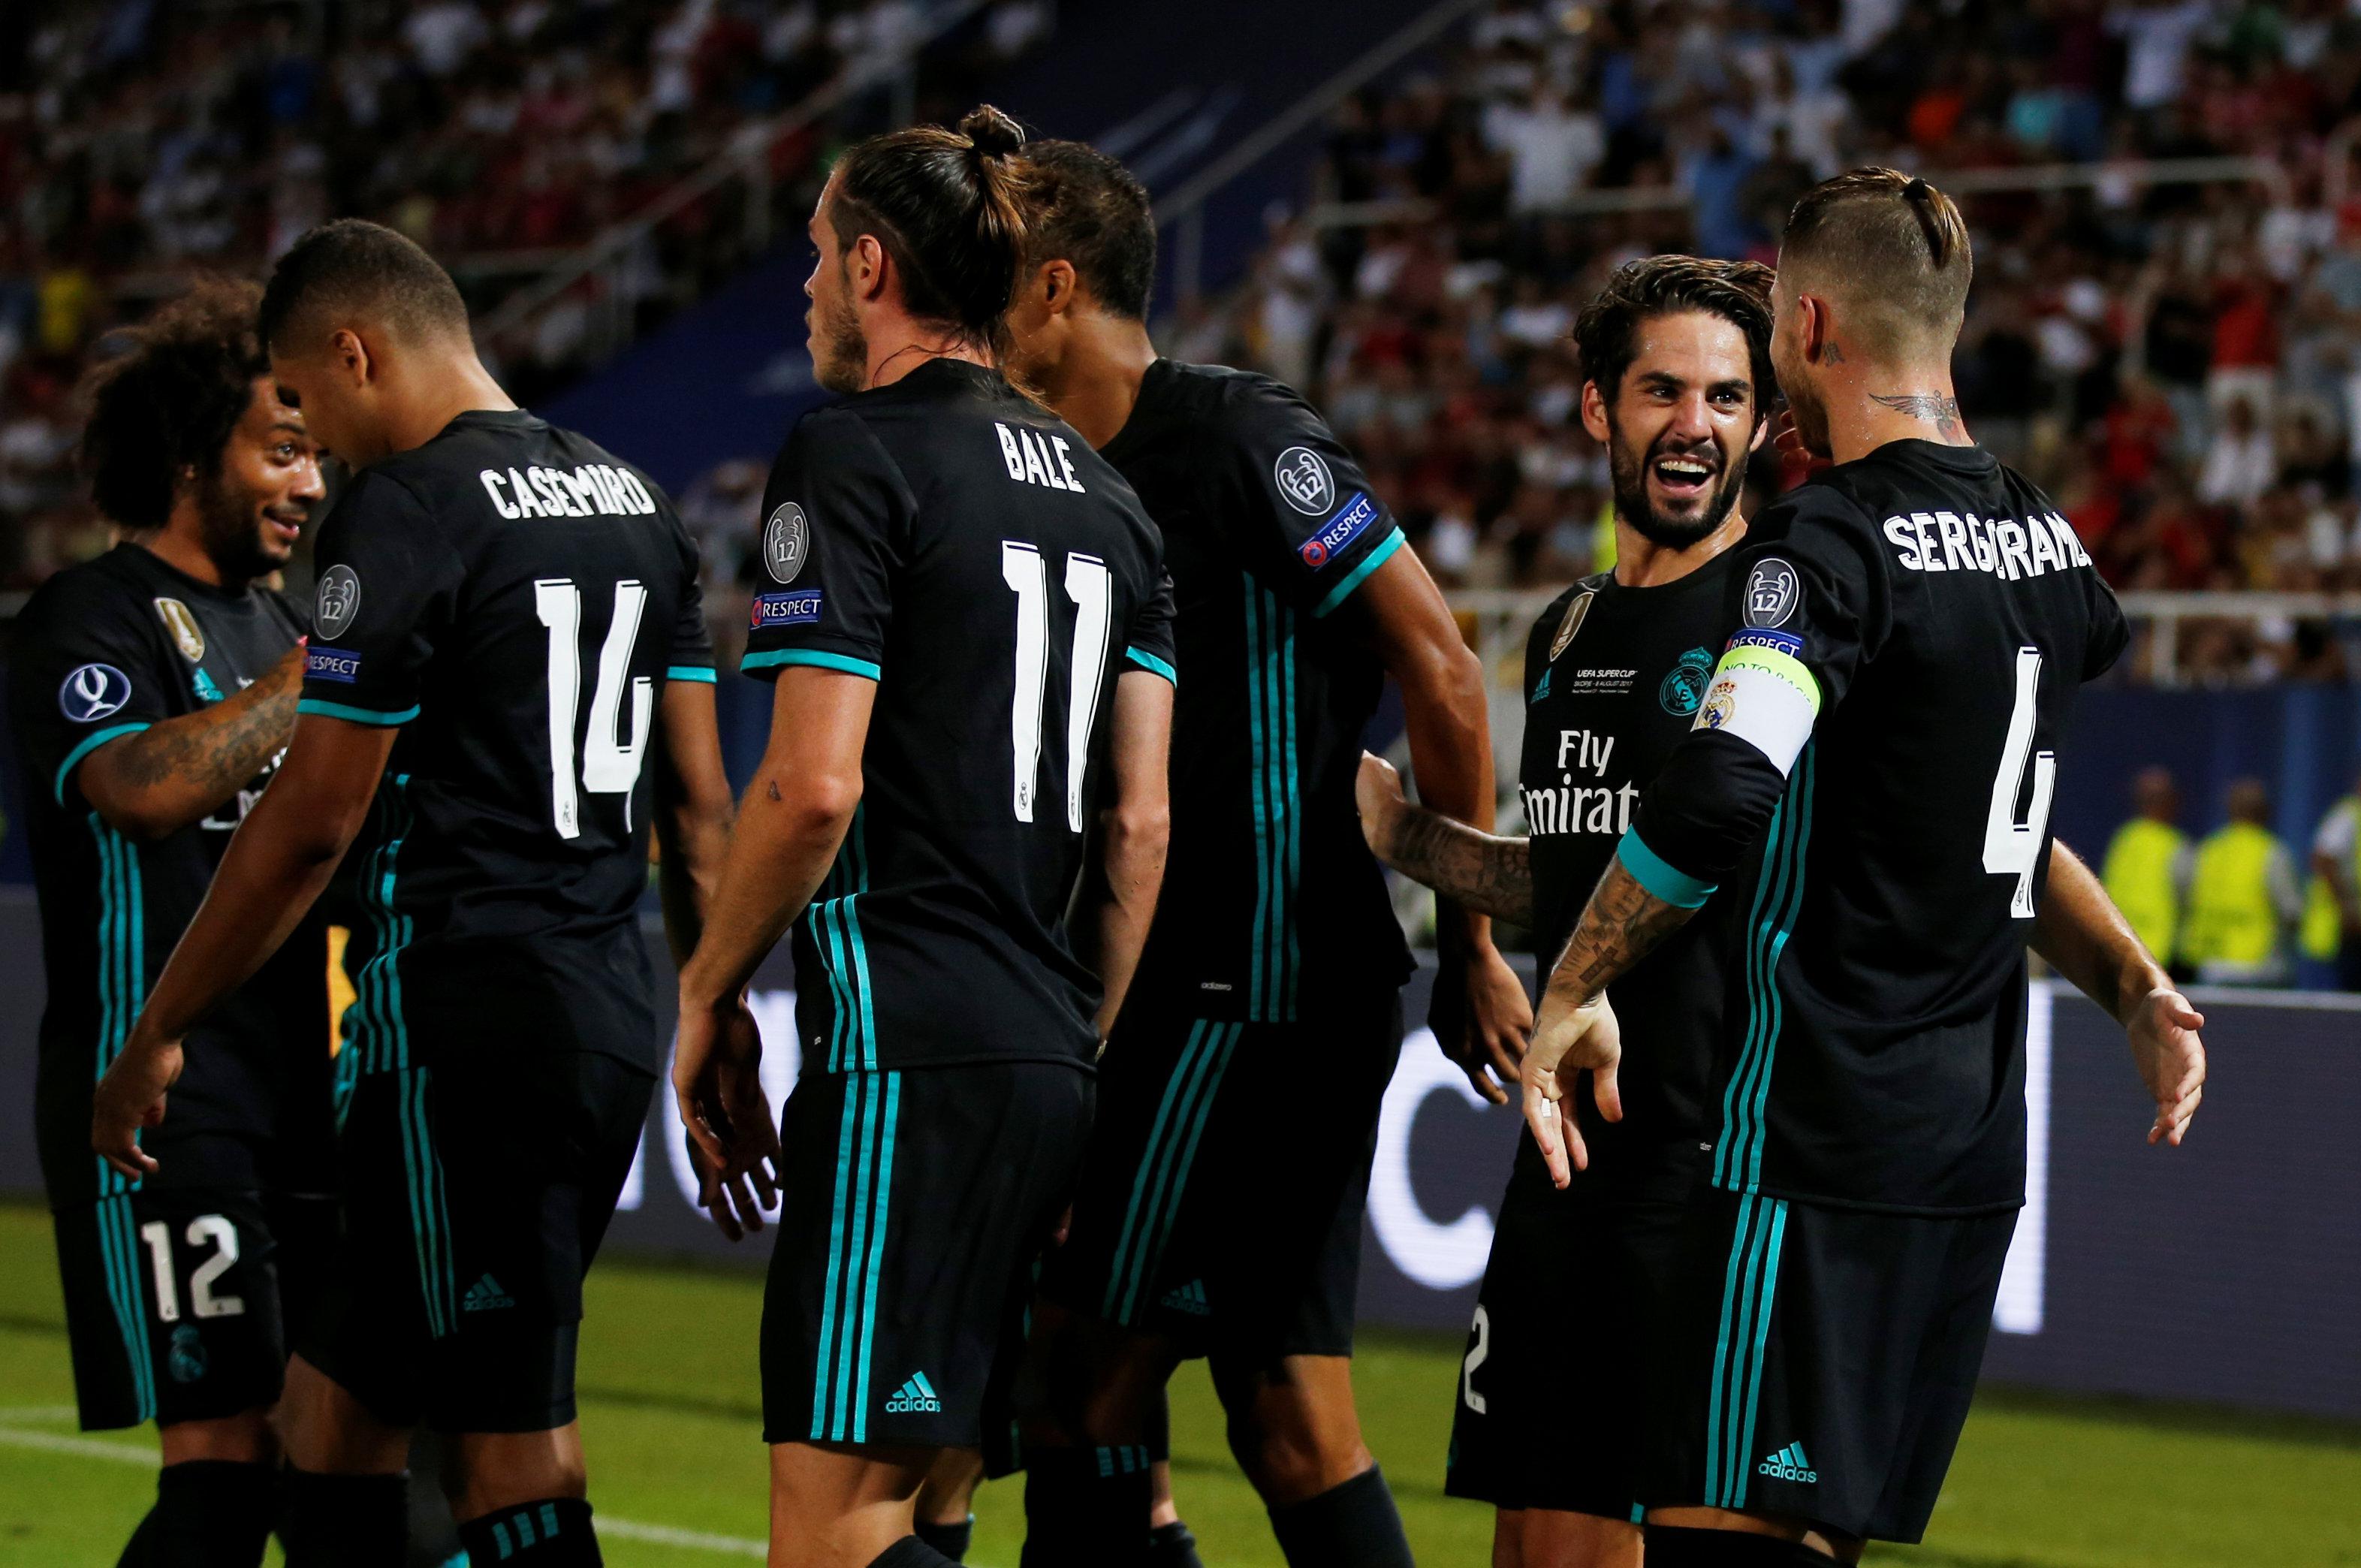 إيسكو يحتفل مع لاعبى ريال مدريد